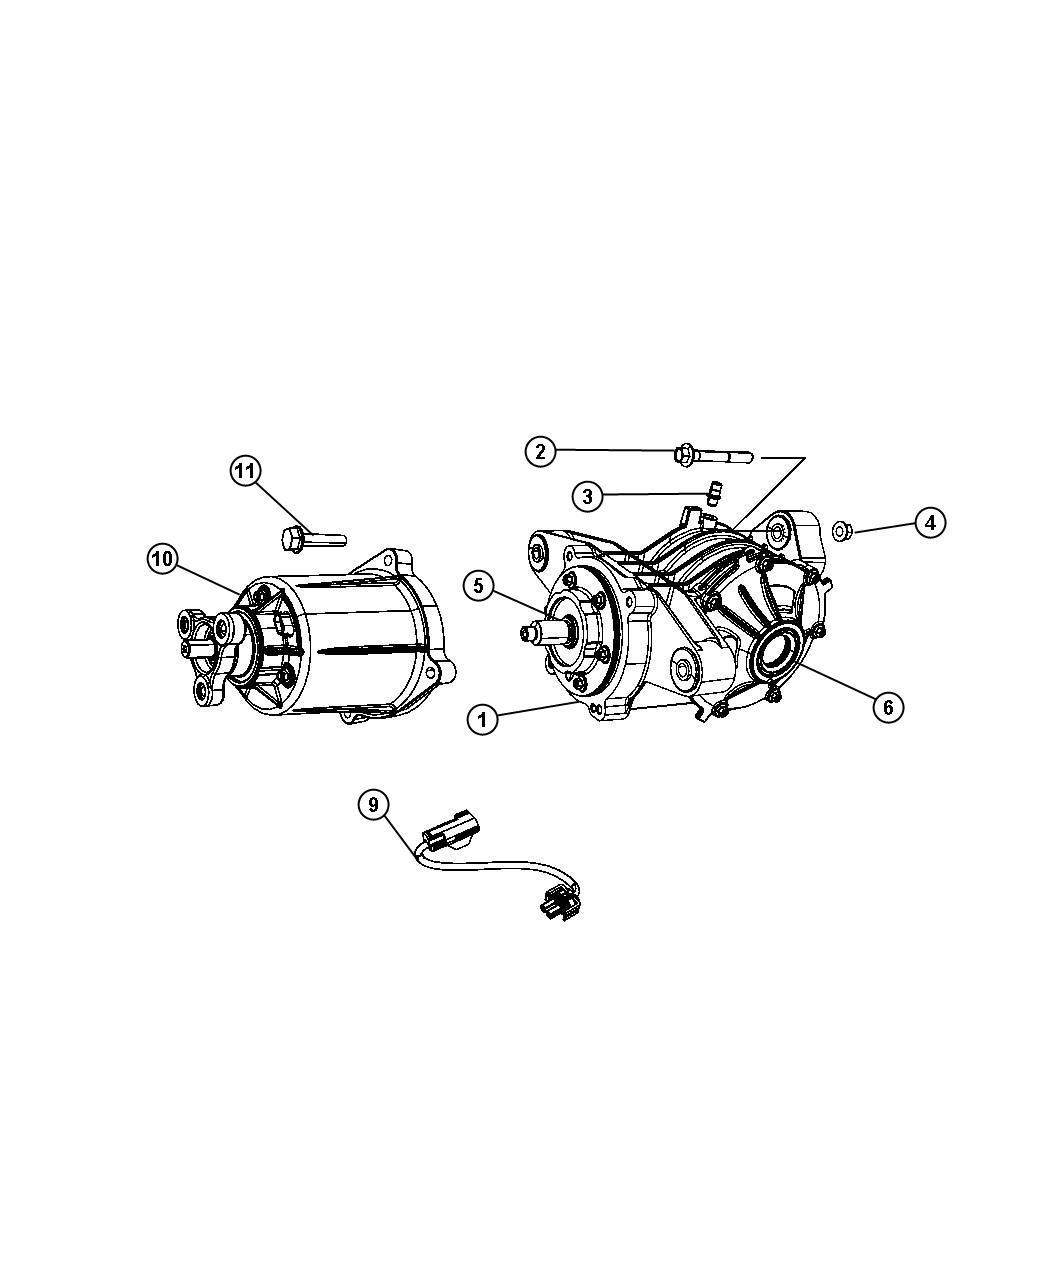 Chrysler Sebring Bdorc Viscous Unit Kit Rear Axle